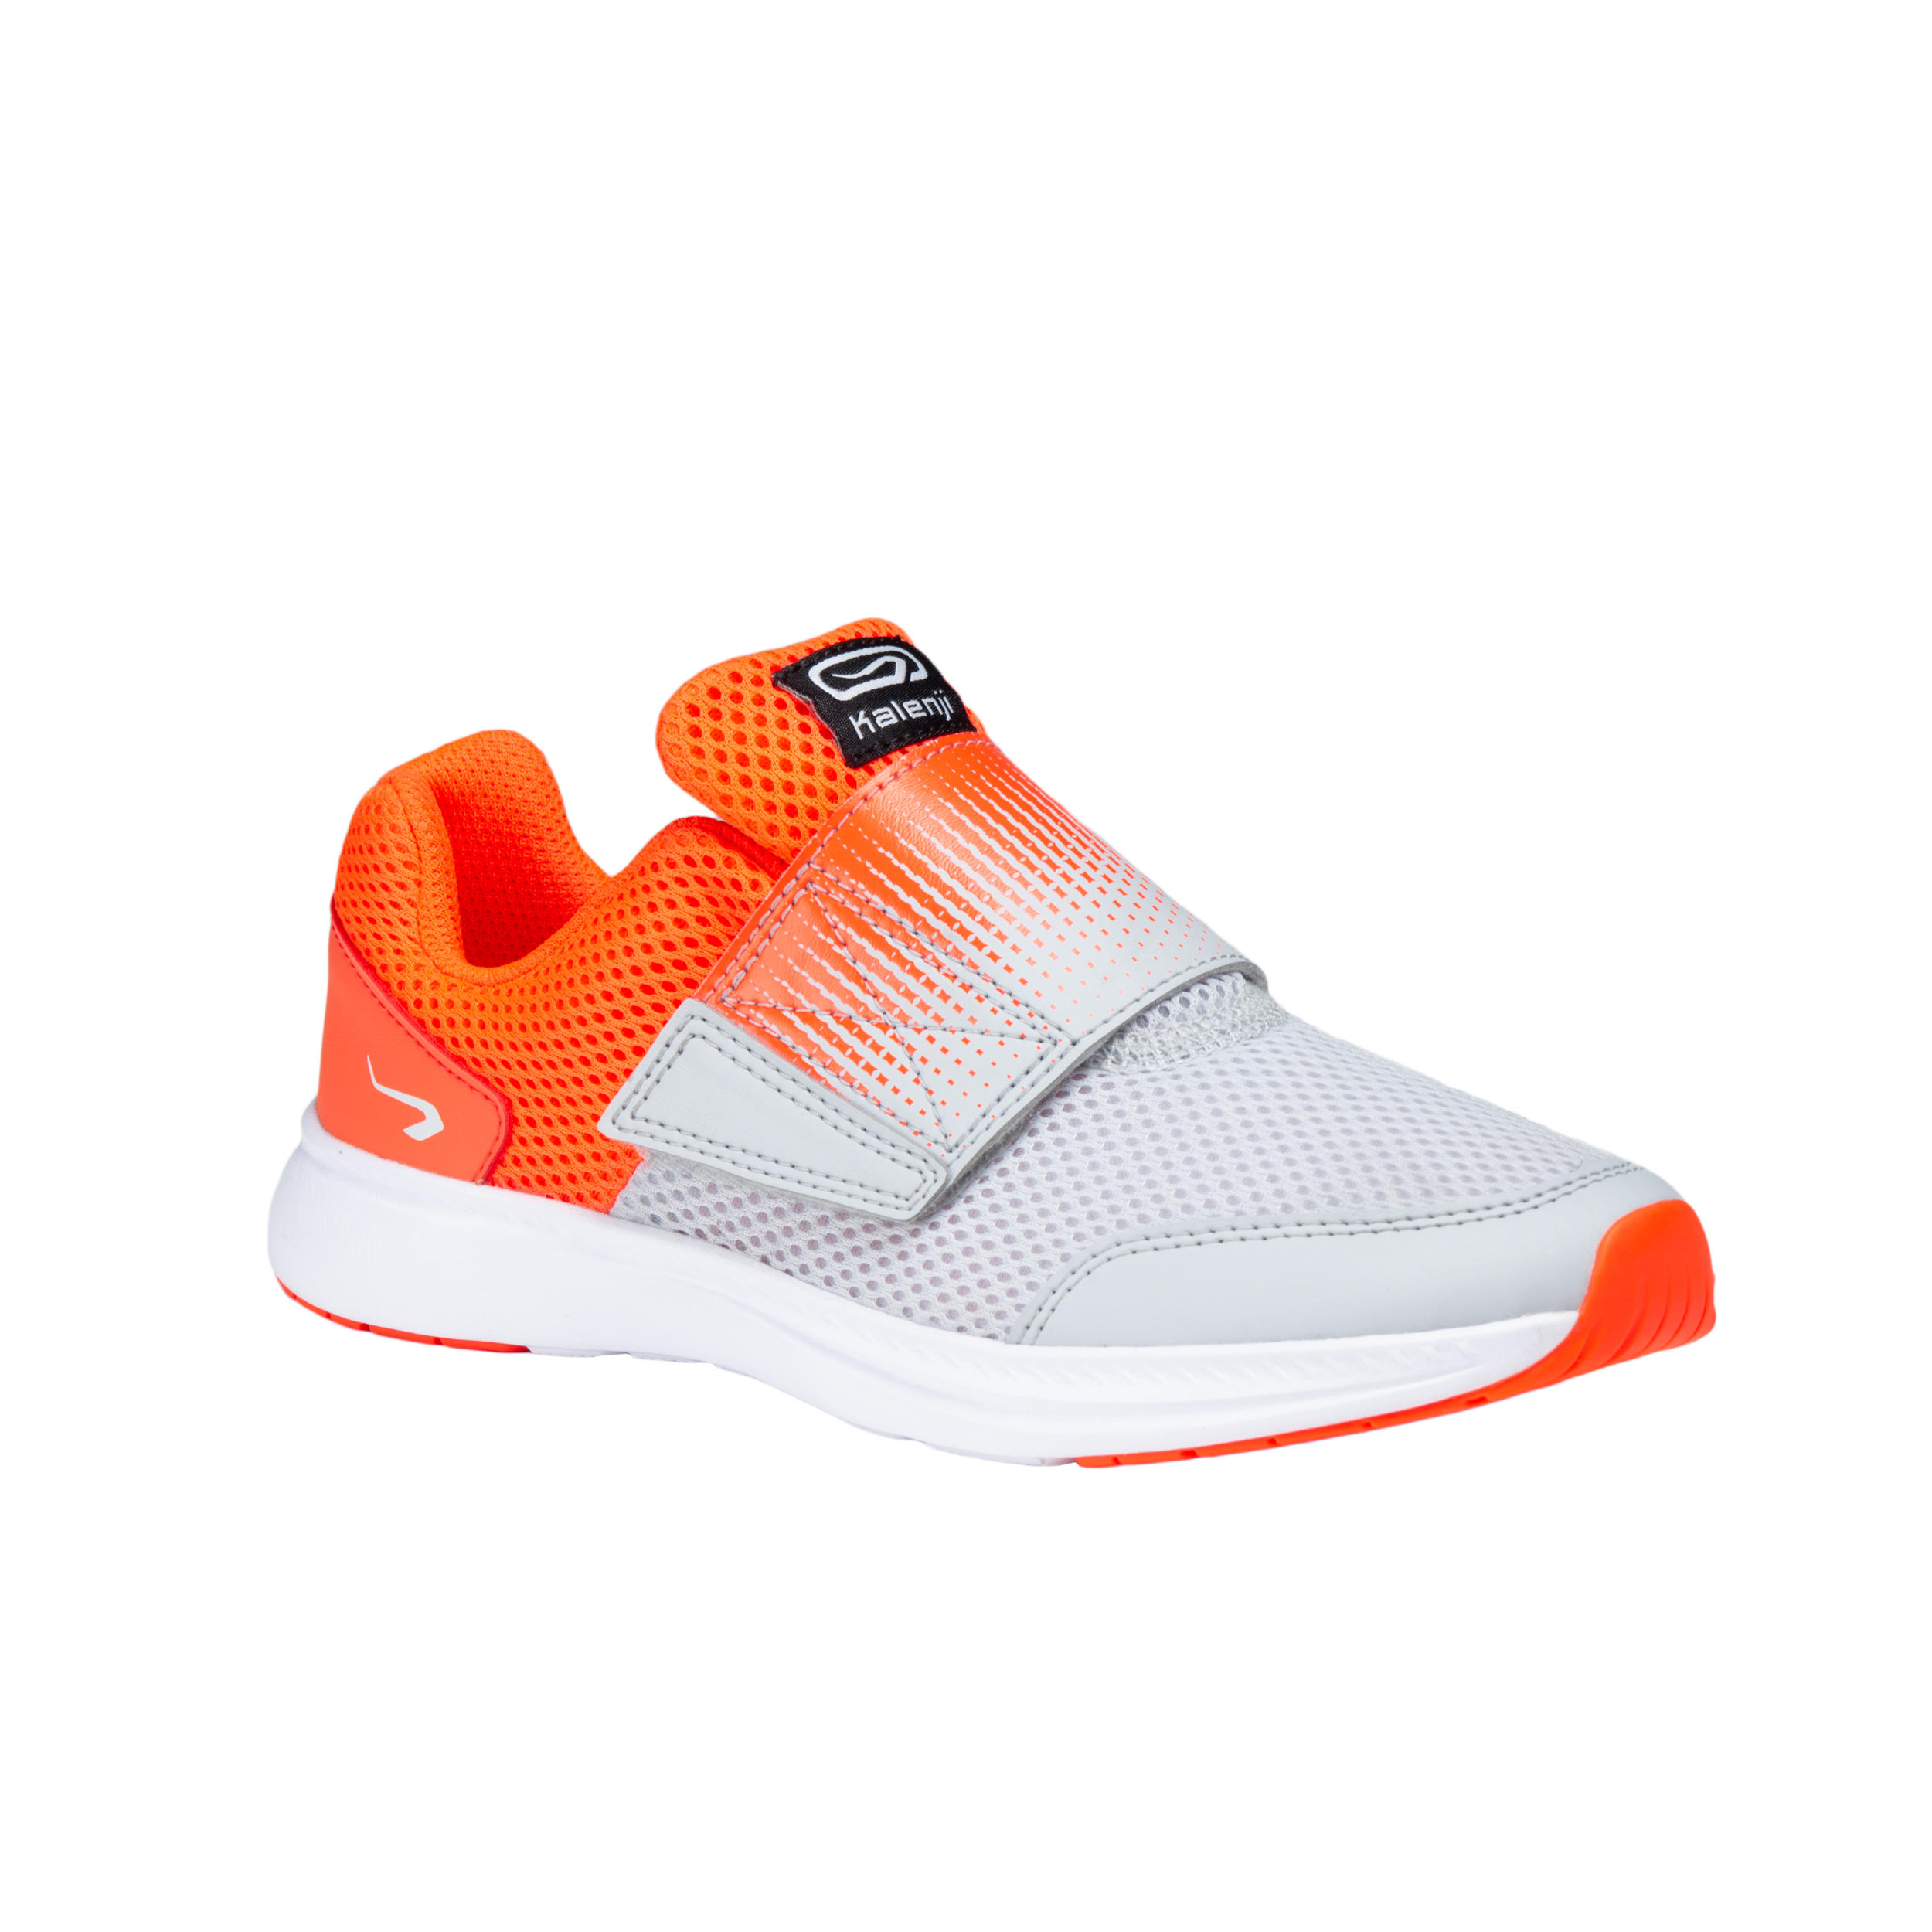 AT Easy Children's Shoes - Decathlon